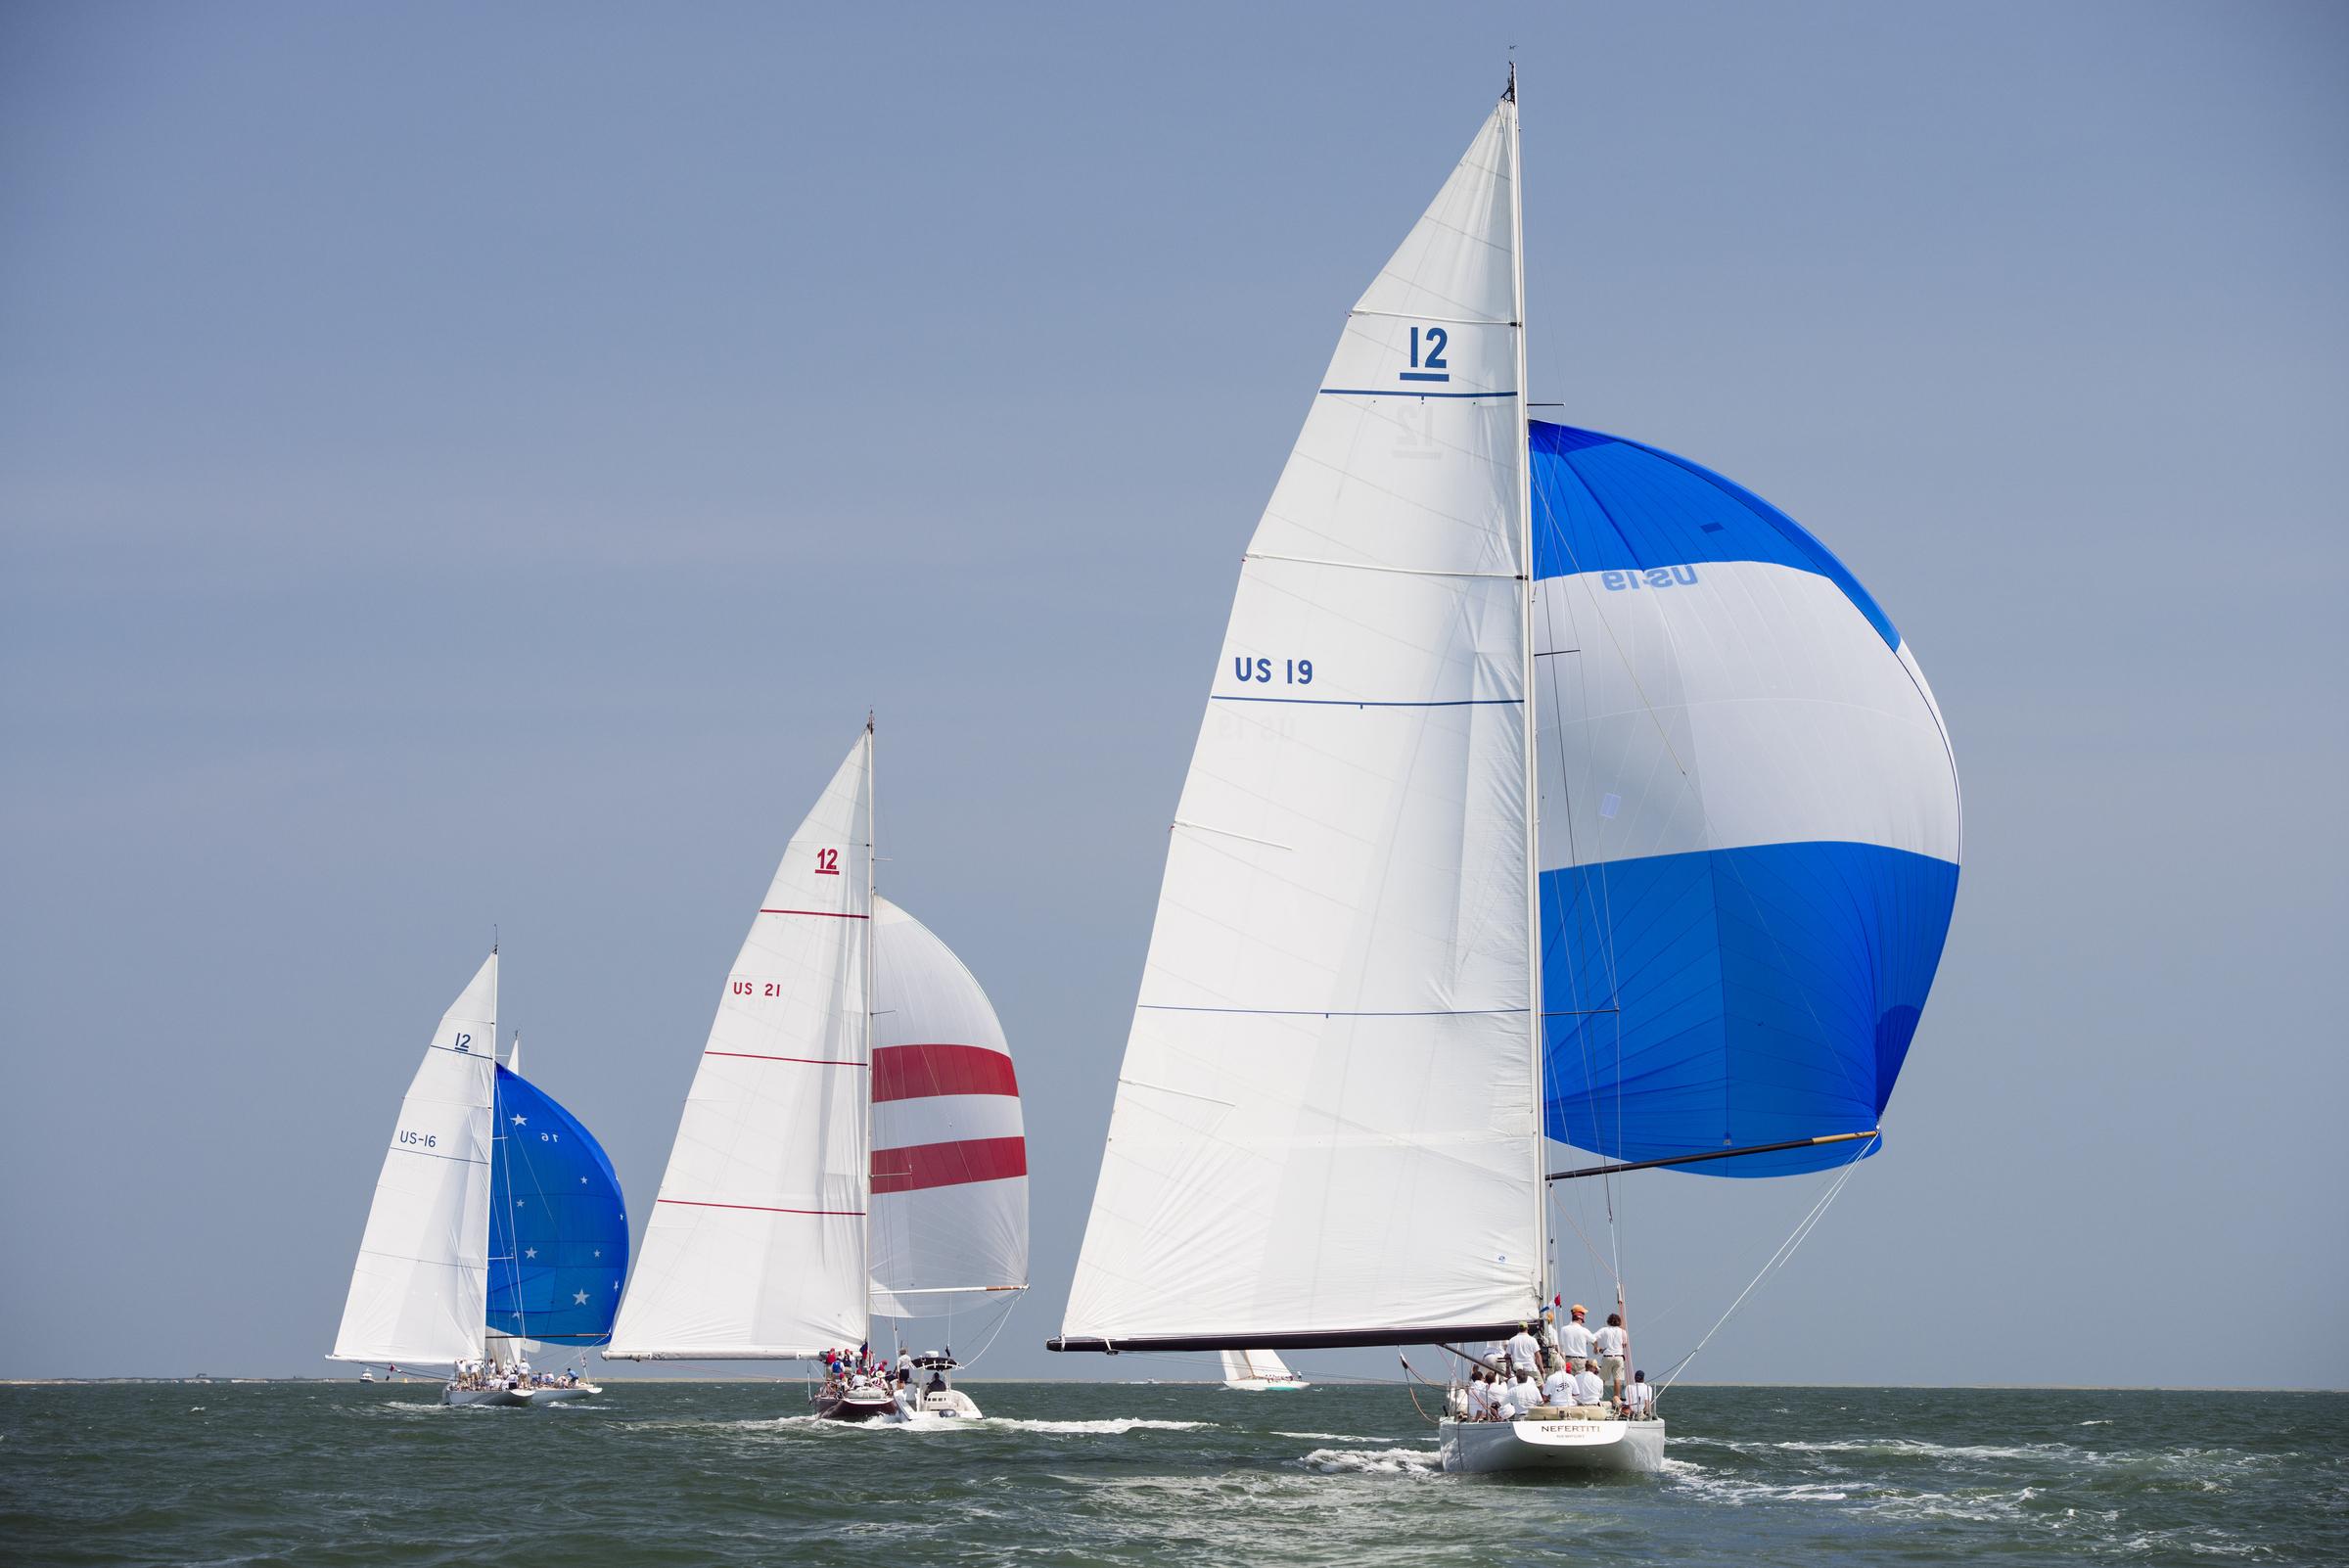 Ahab, Hilfiger und Co.: Nantucket - Literaturboot - Natur & Forschung, Revierführer & Nautic